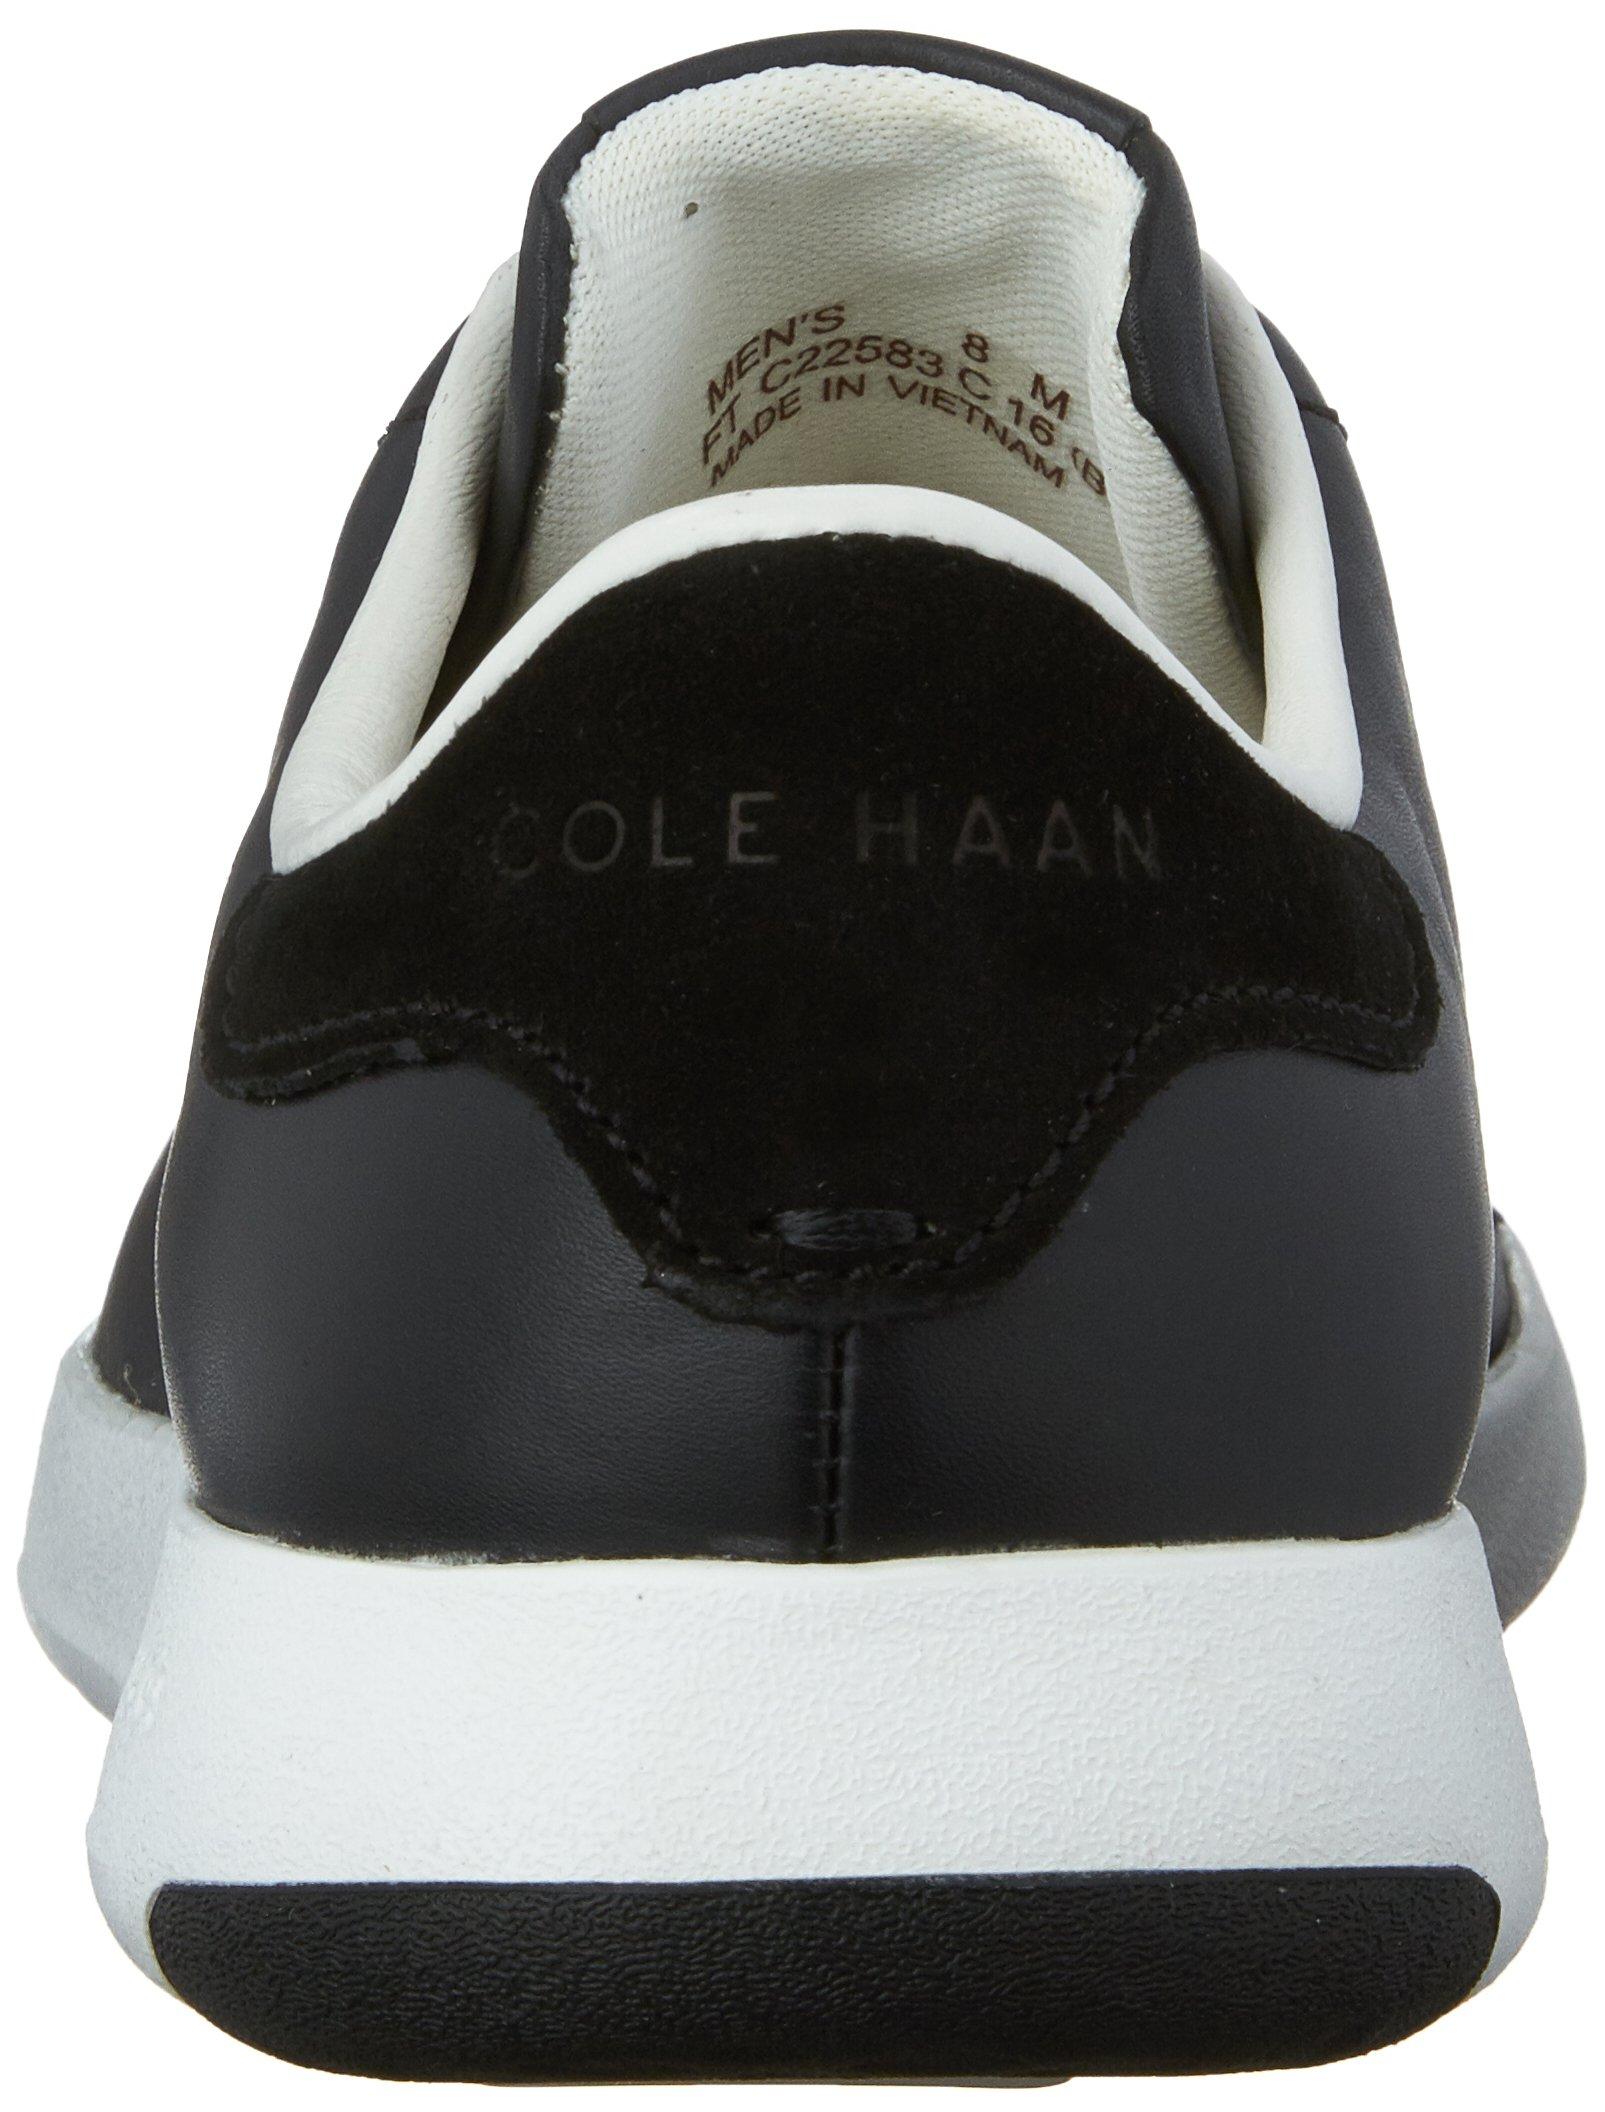 Cole Haan Men's Grandpro Tennis Oxford, Black, 7 M US by Cole Haan (Image #2)